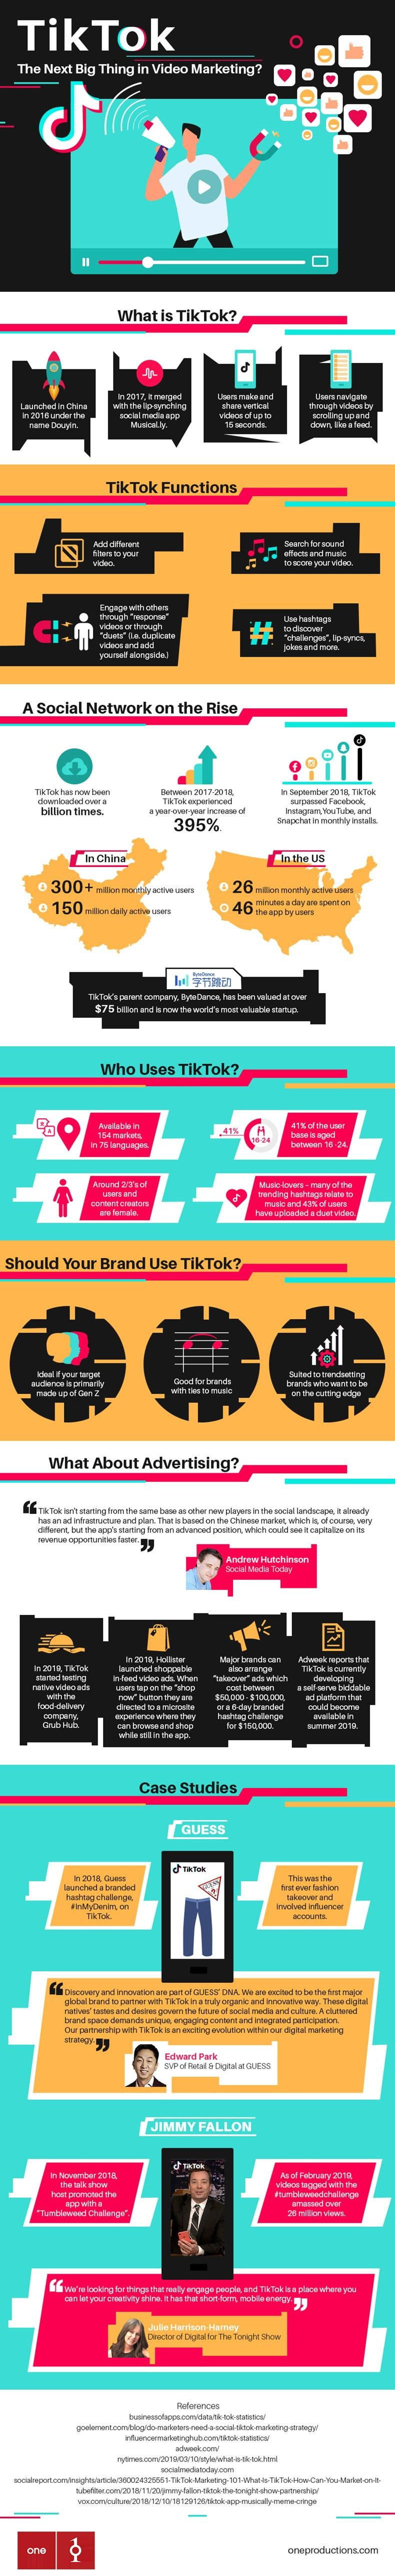 Tiktok The Next Big Thing In Video Marketing Infographic Video Marketing Infographic Infographic Marketing Social Media Infographic